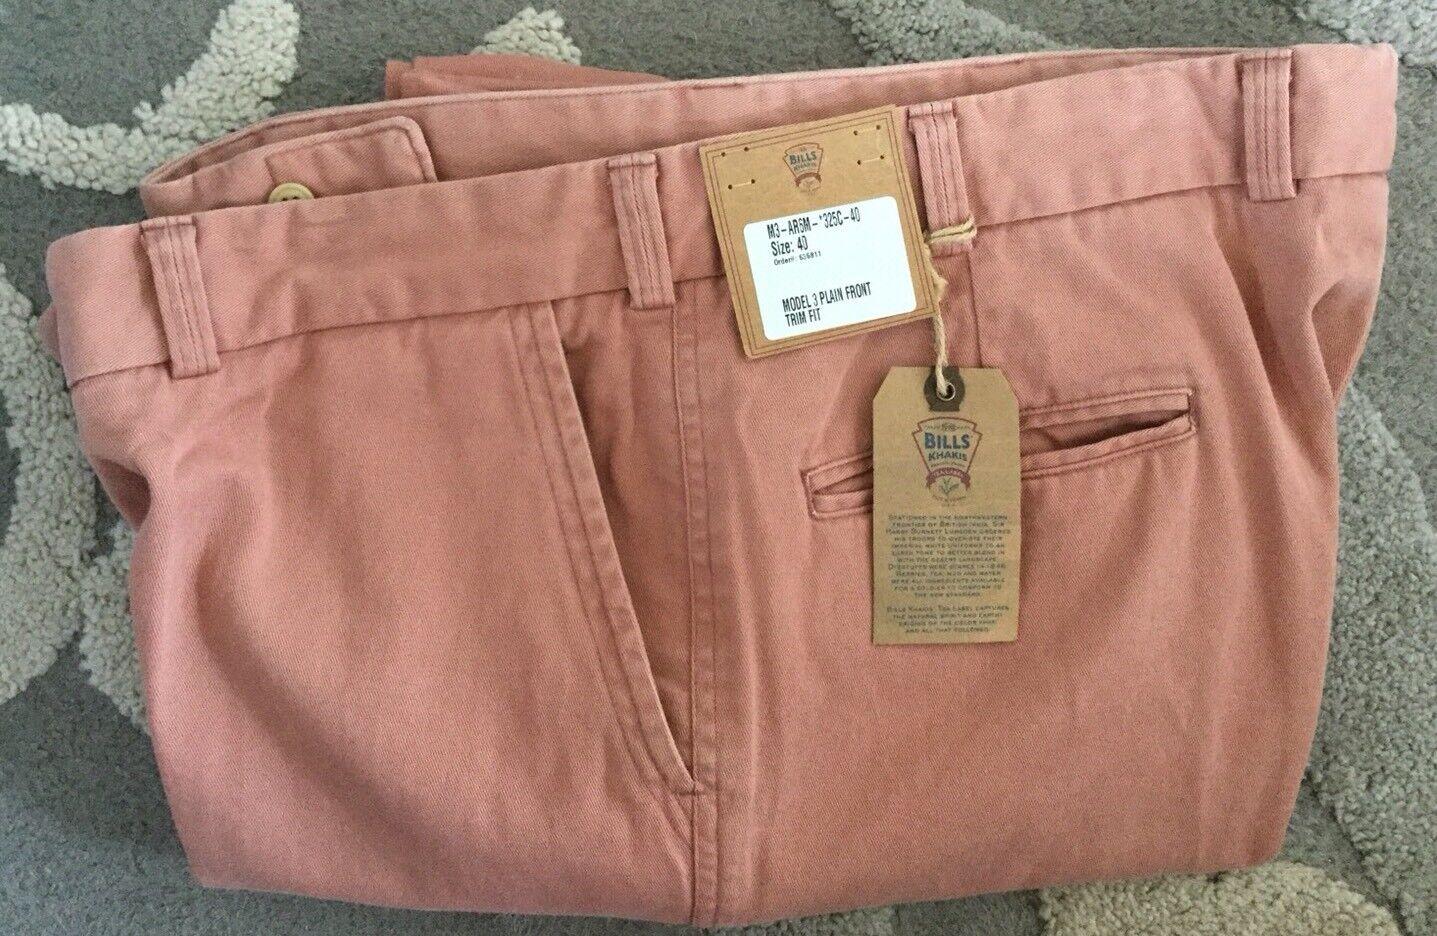 NWT-Bills khakis M3-AR6M Size 40X32 TRIM Cuffed PLAIN COTTON pink